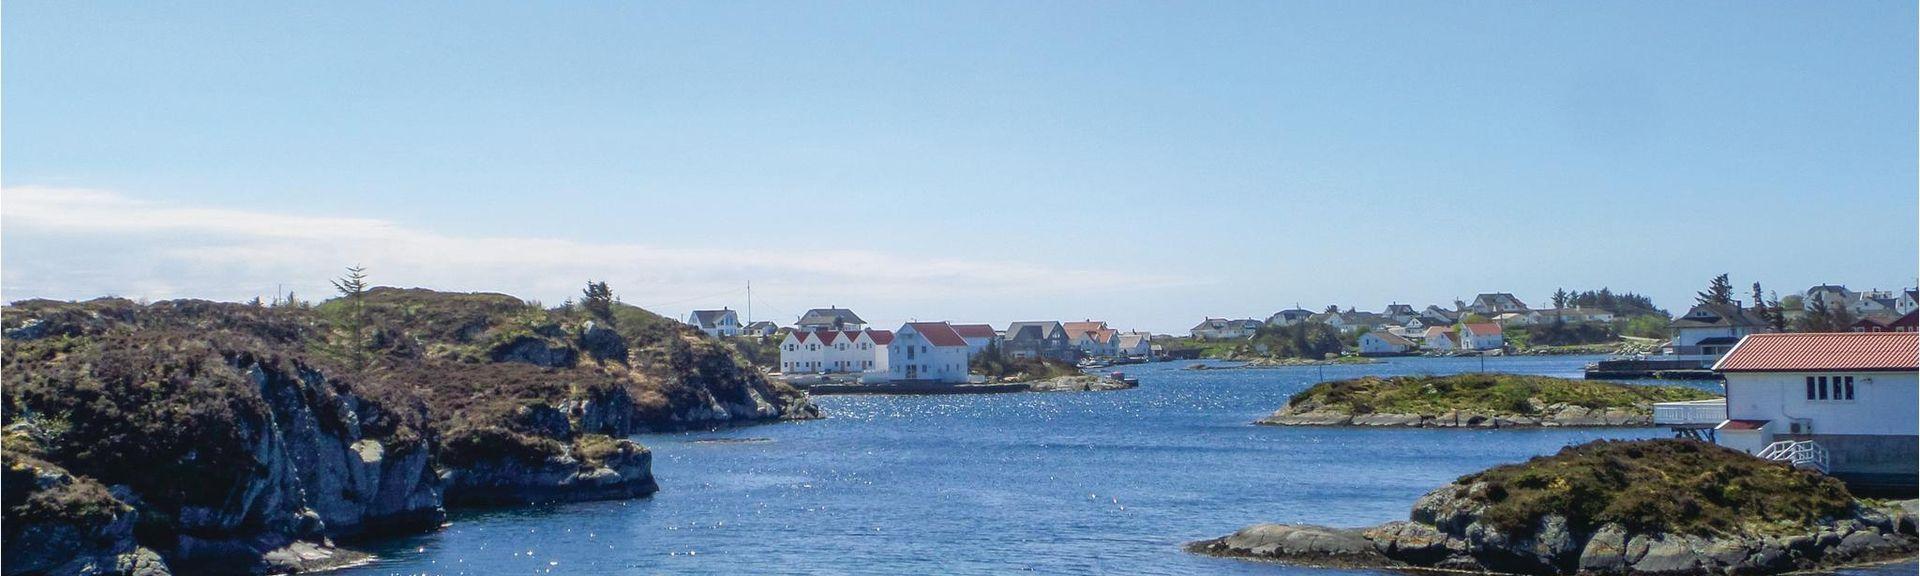 Åkrehamn, Karmoy, Rogaland (county), Norway